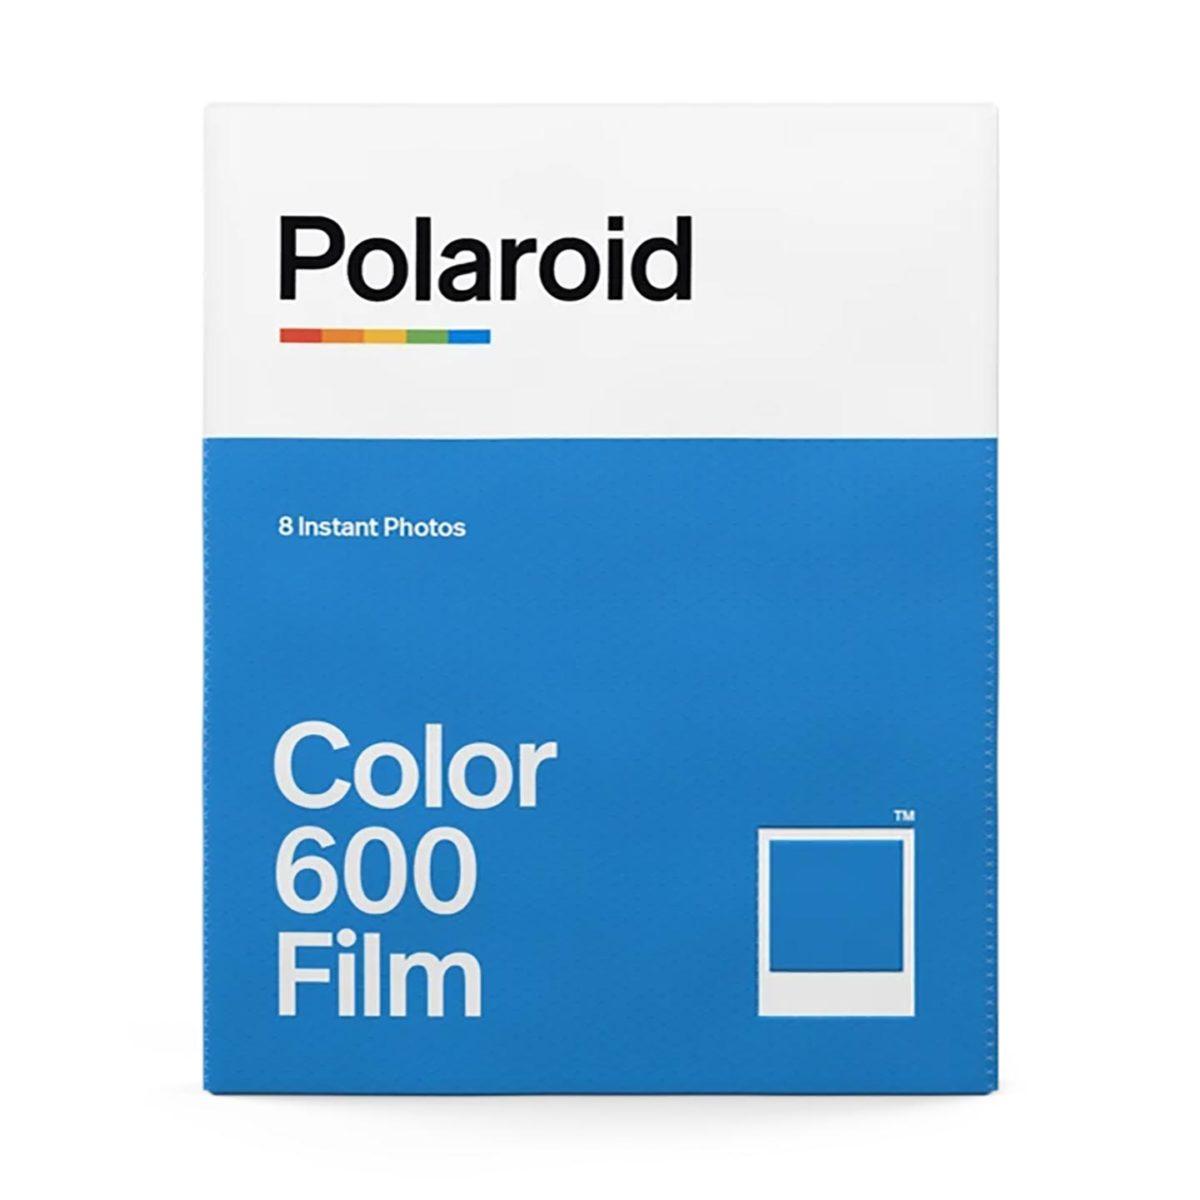 polaroid_600_color_film_02